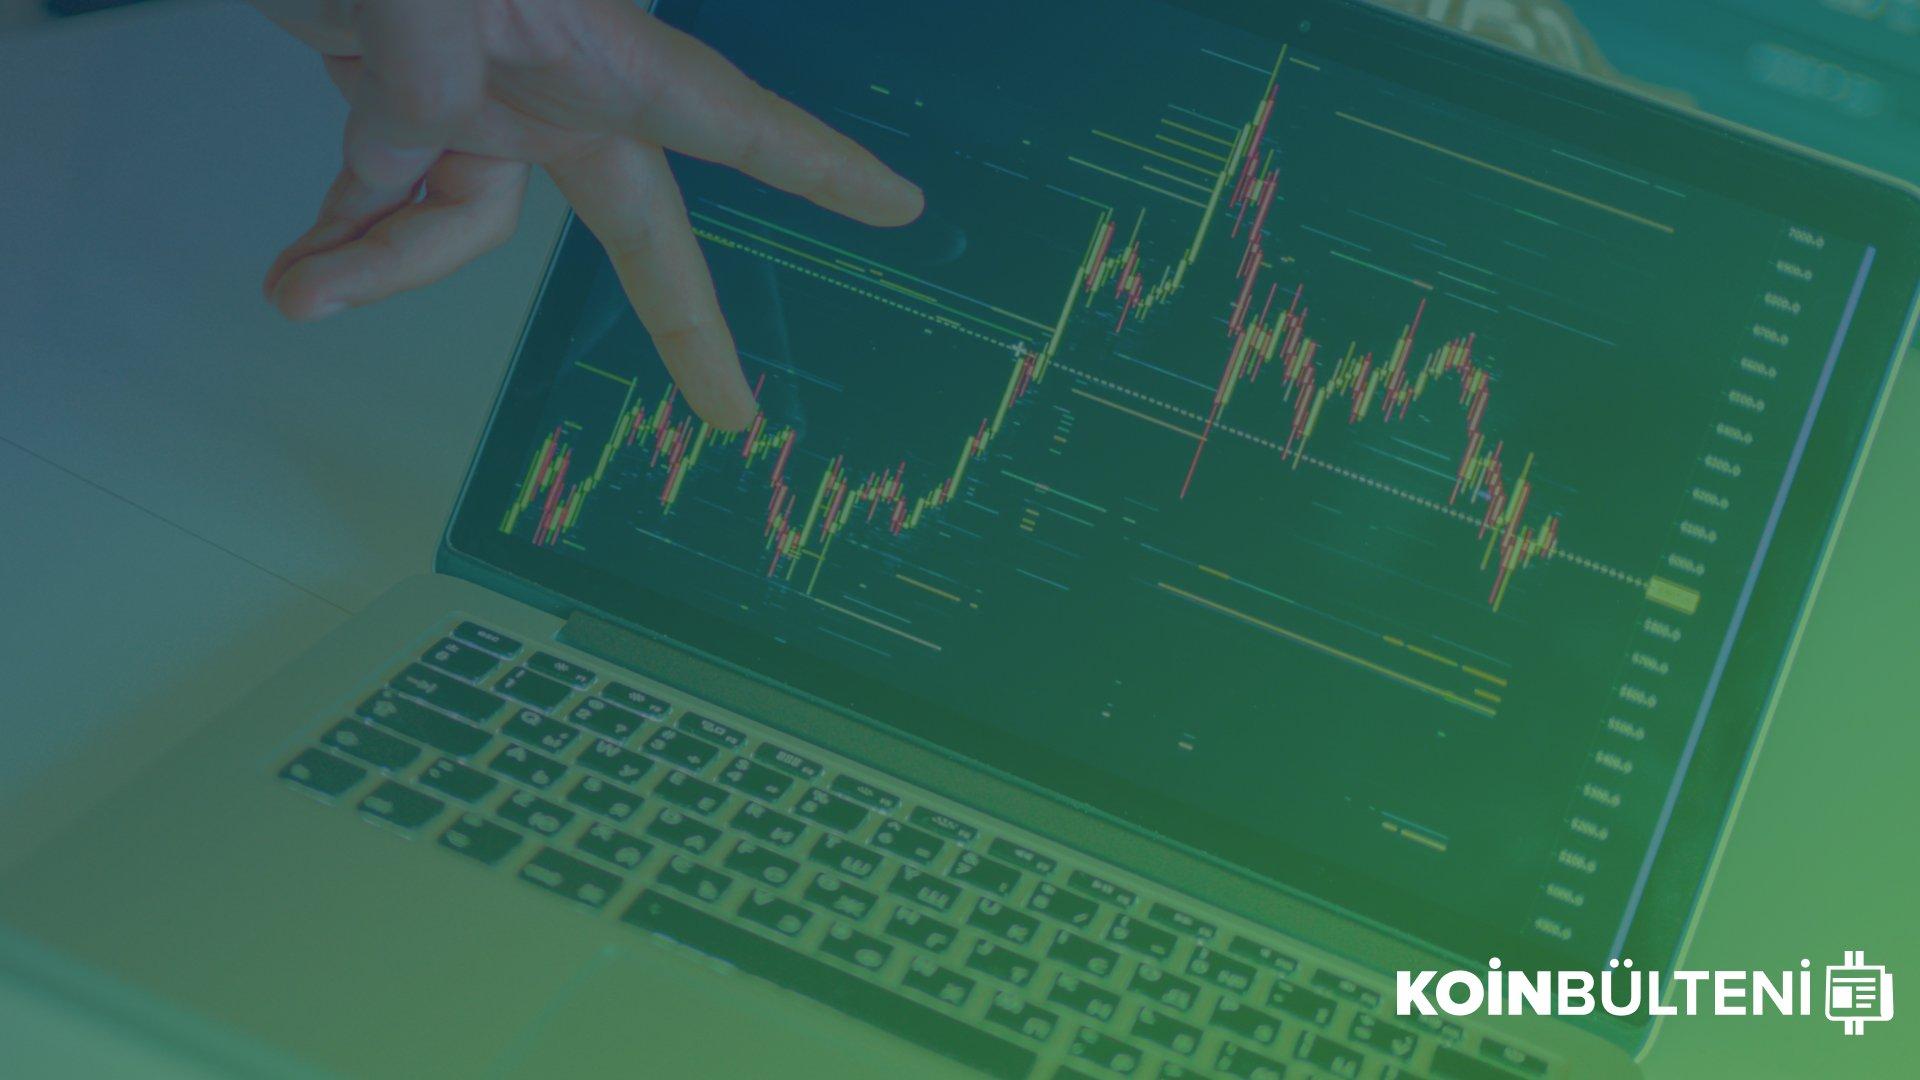 bitcoin-btc-fiyat-analiz-tahmin-cnbc